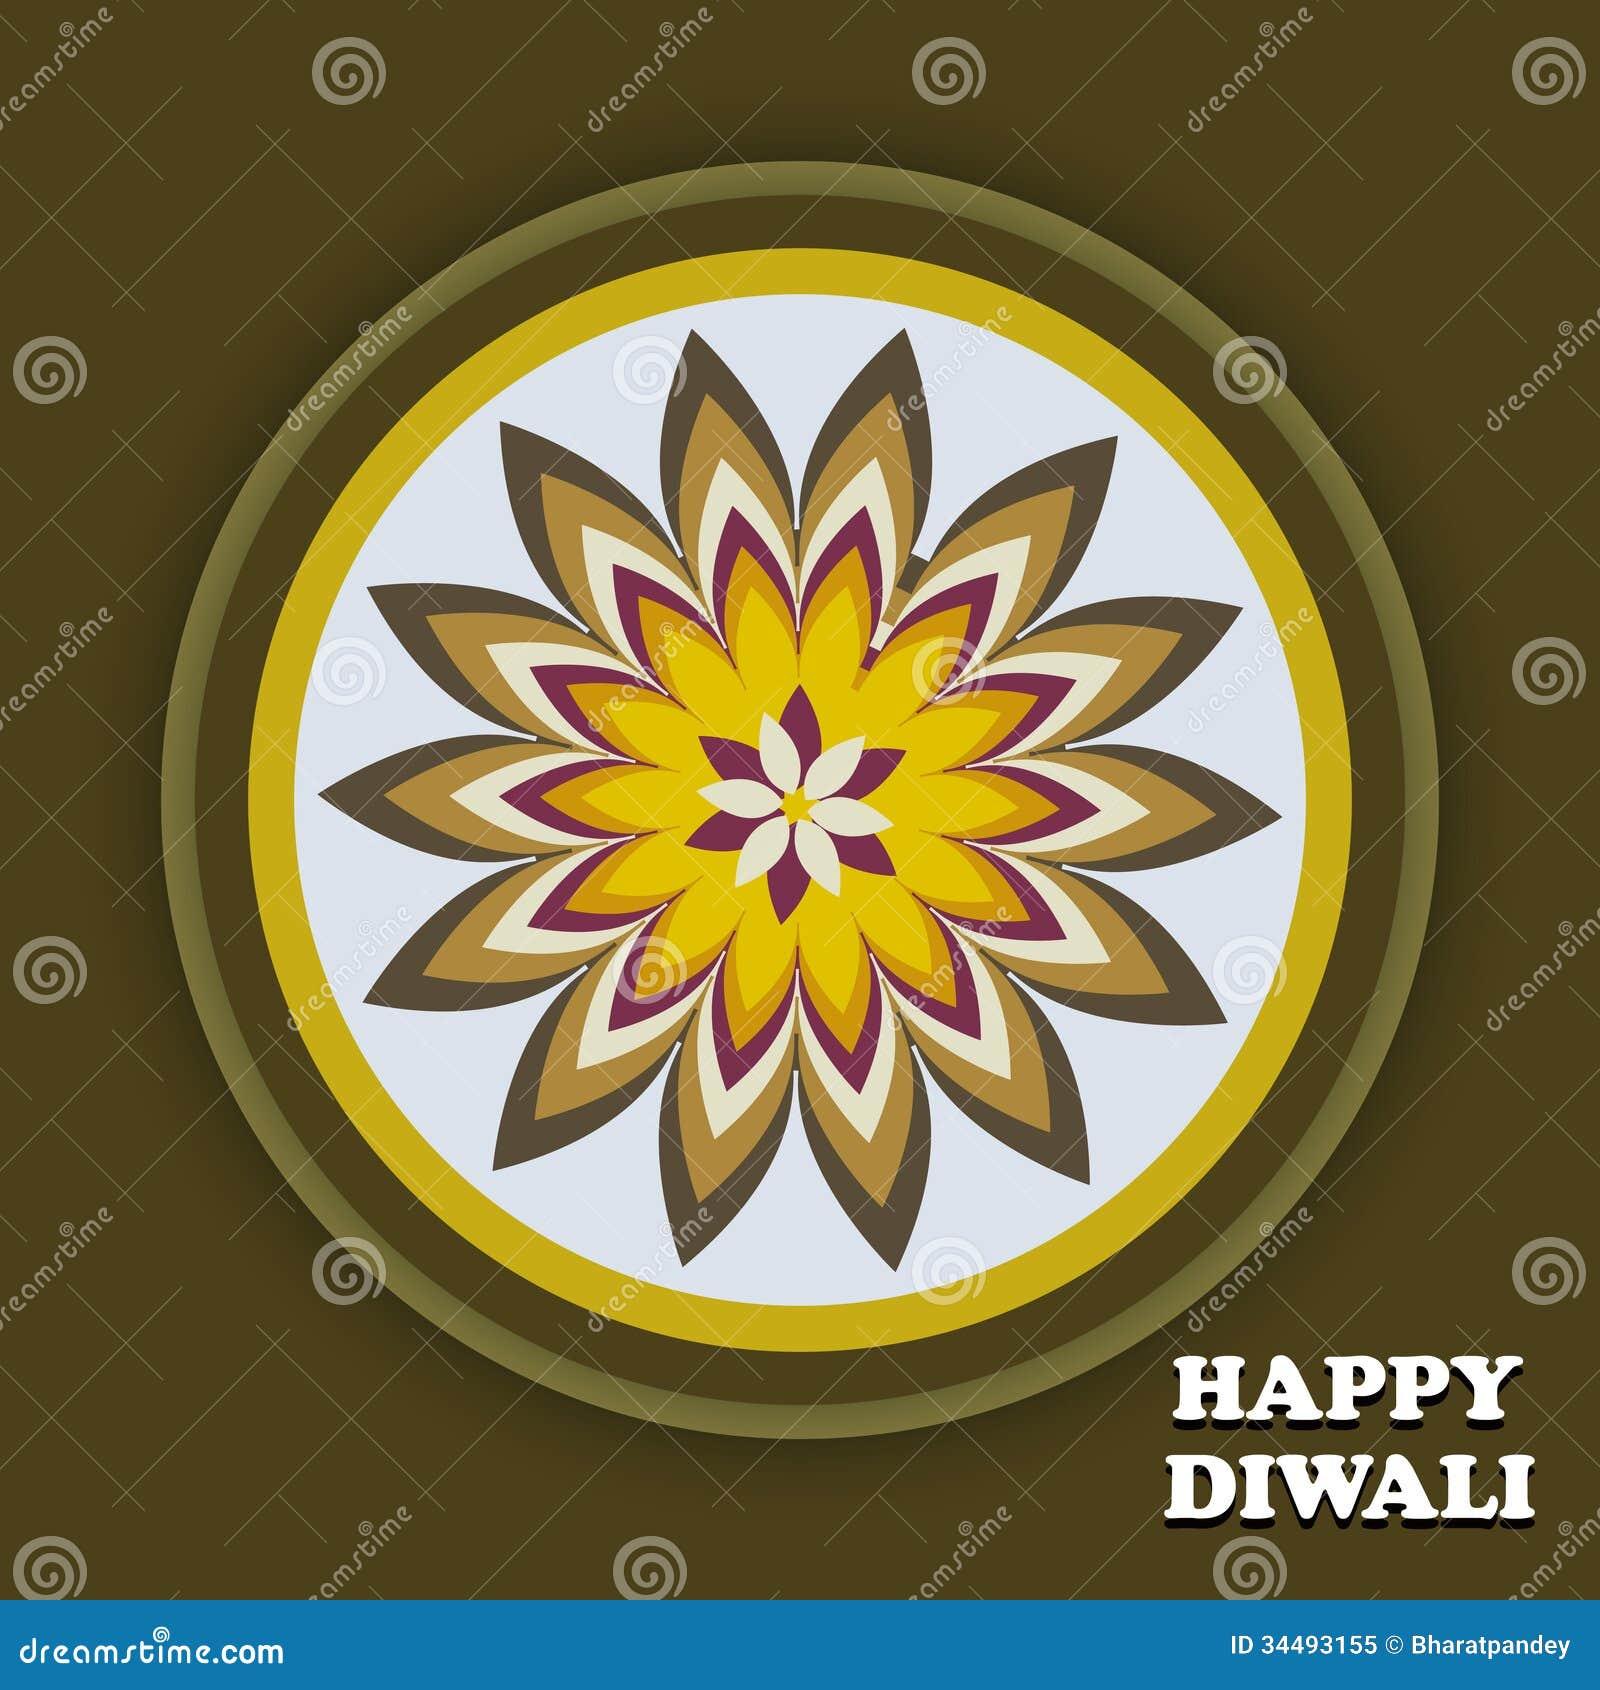 Beautiful creative art colorful diwali rangoli royalty for Beautiful creative art